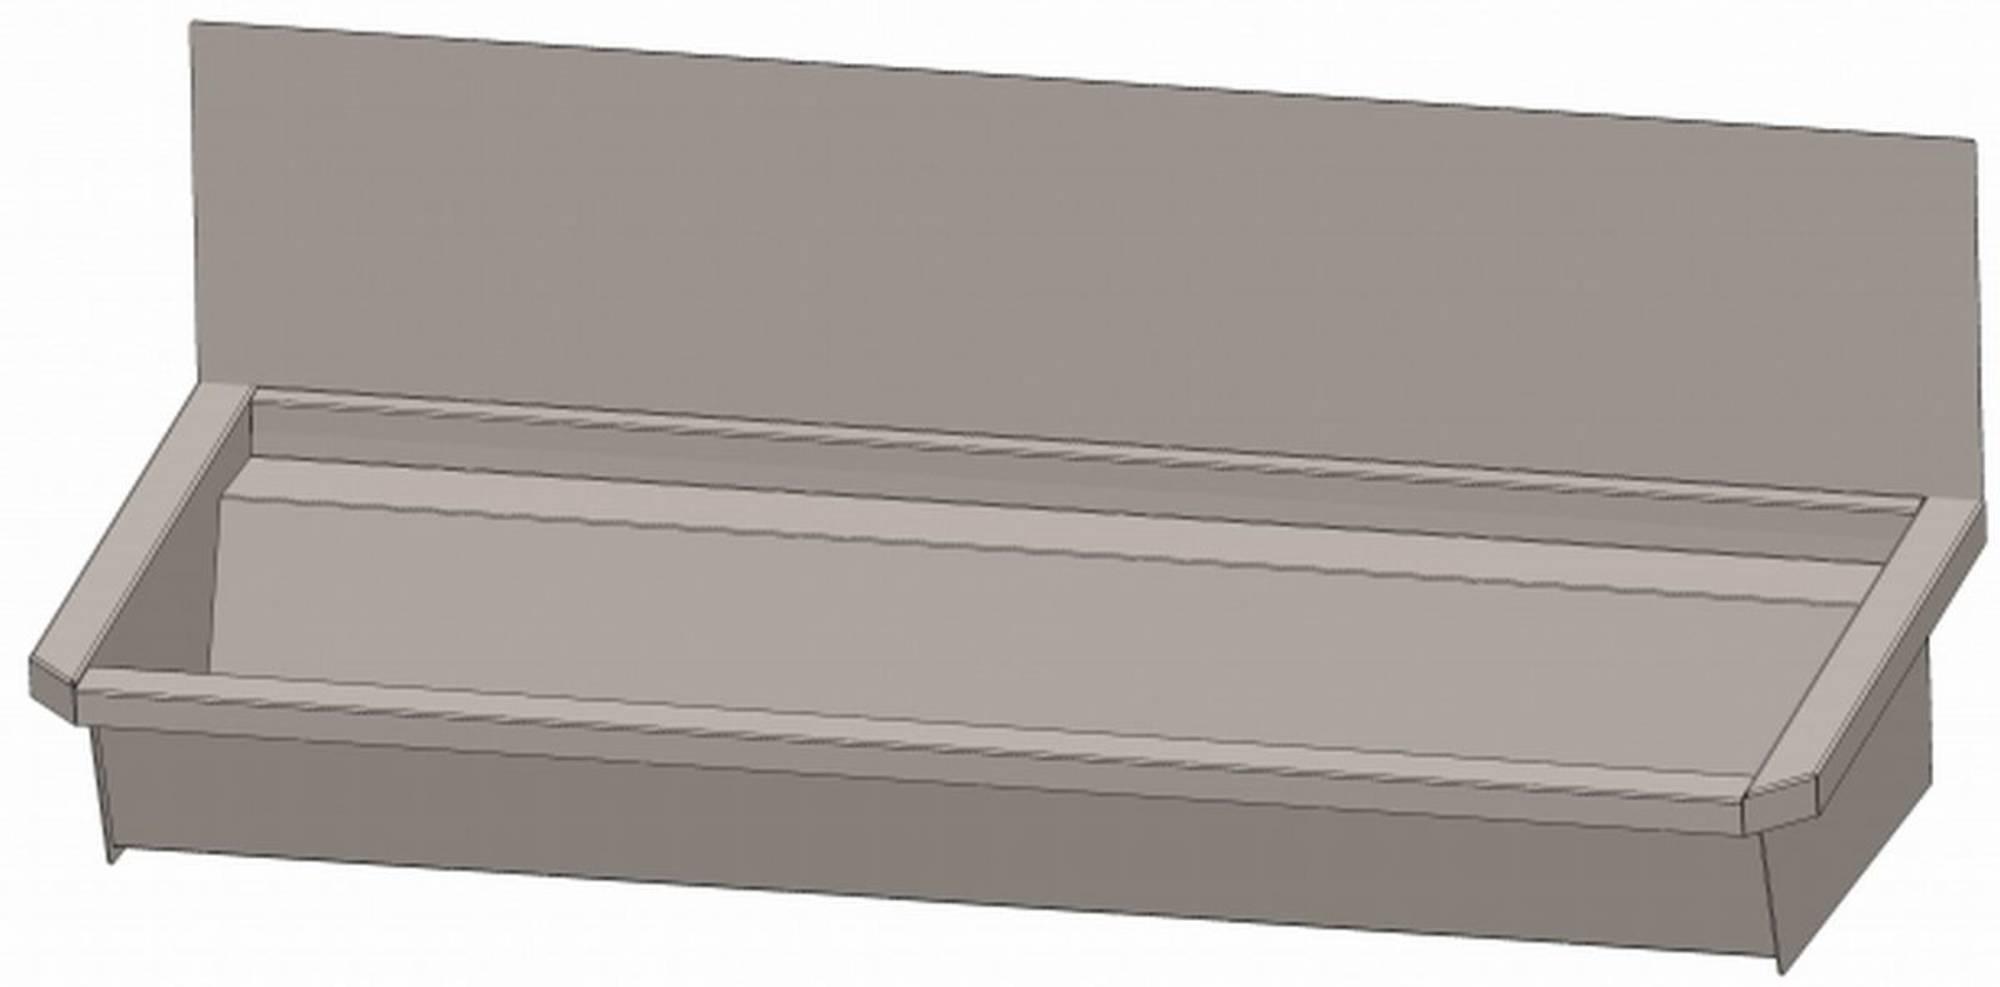 INTERSAN SANILAV wasgoot met spatbord 120 cm.2 pers. zonder leiding INOX 304 (302Z1)